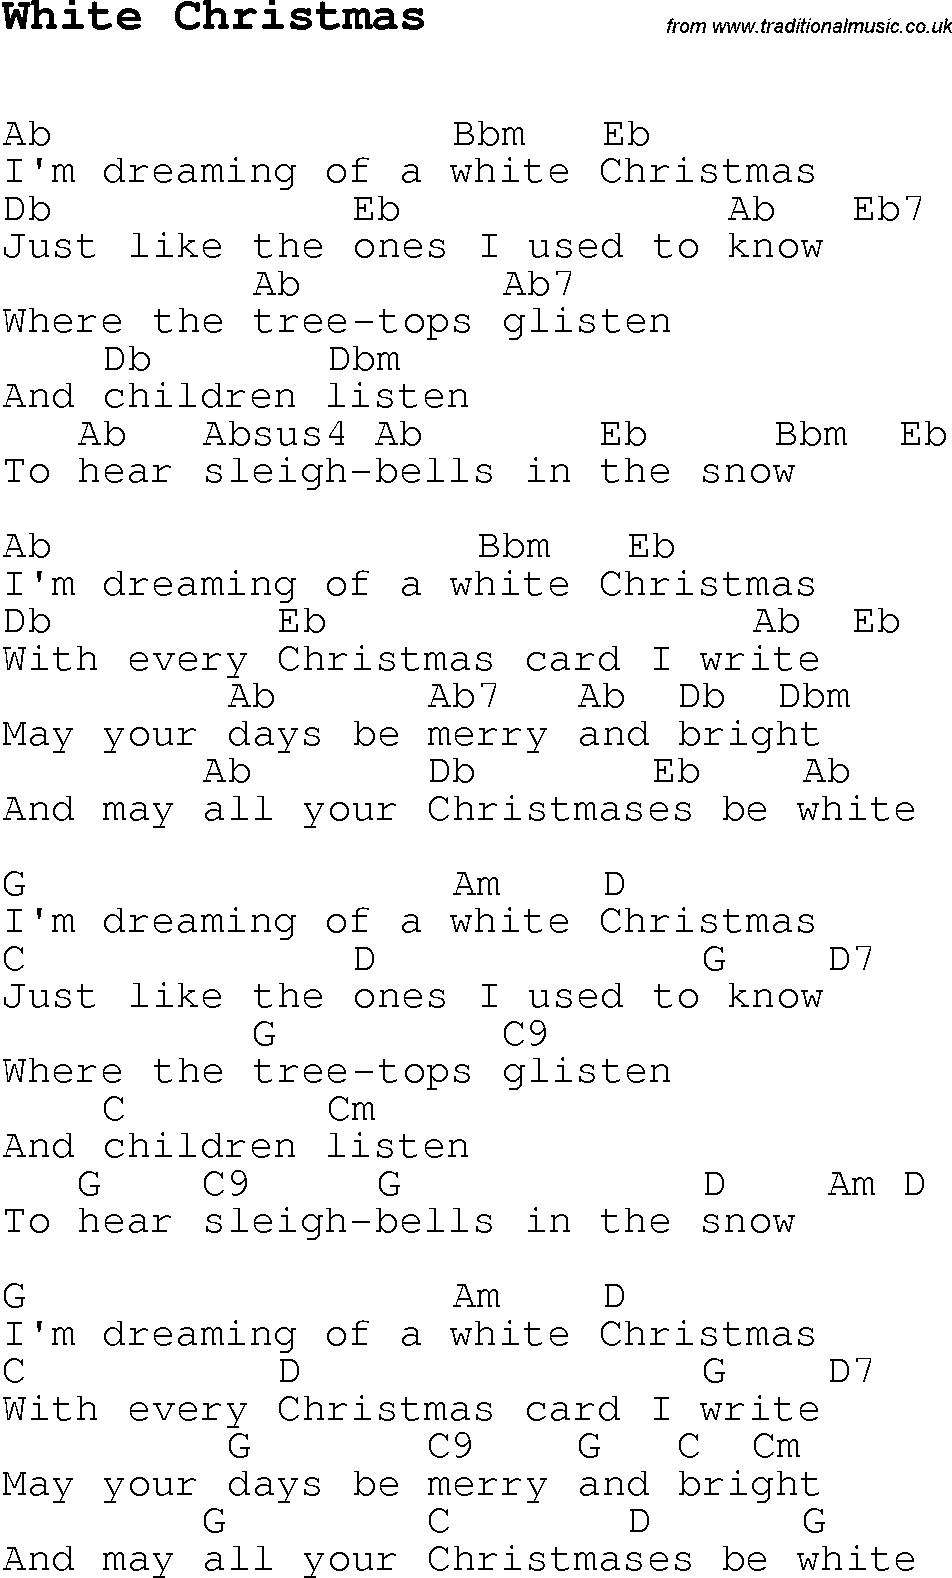 White Christmas Chords Christmas Carolsong Lyrics With Chords For White Christmas